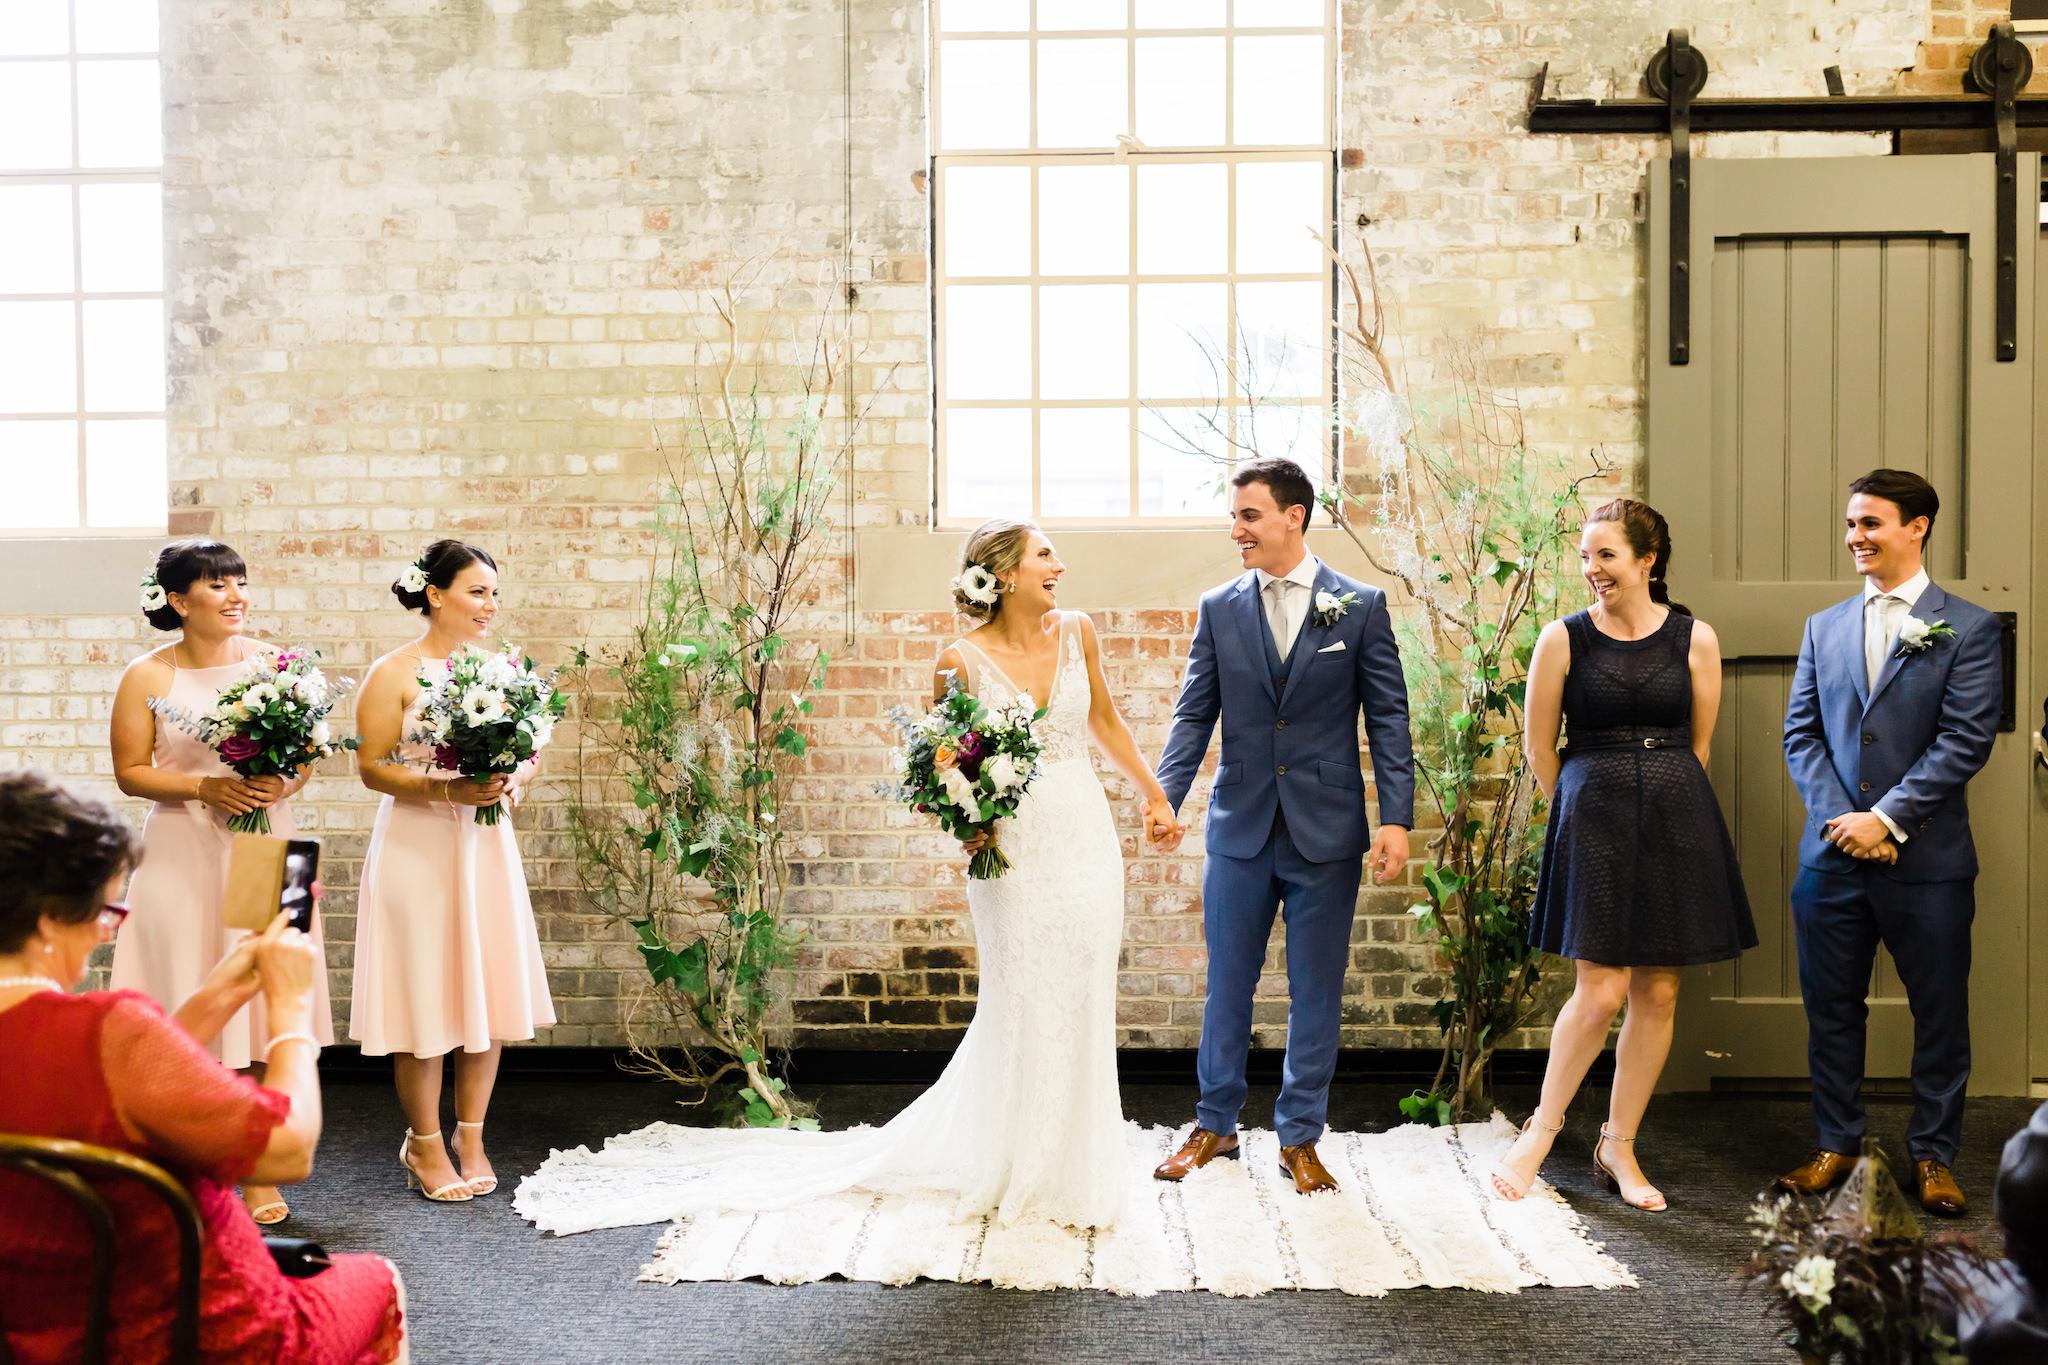 350-SOPHIE  DYLAN WEDDING.jpg